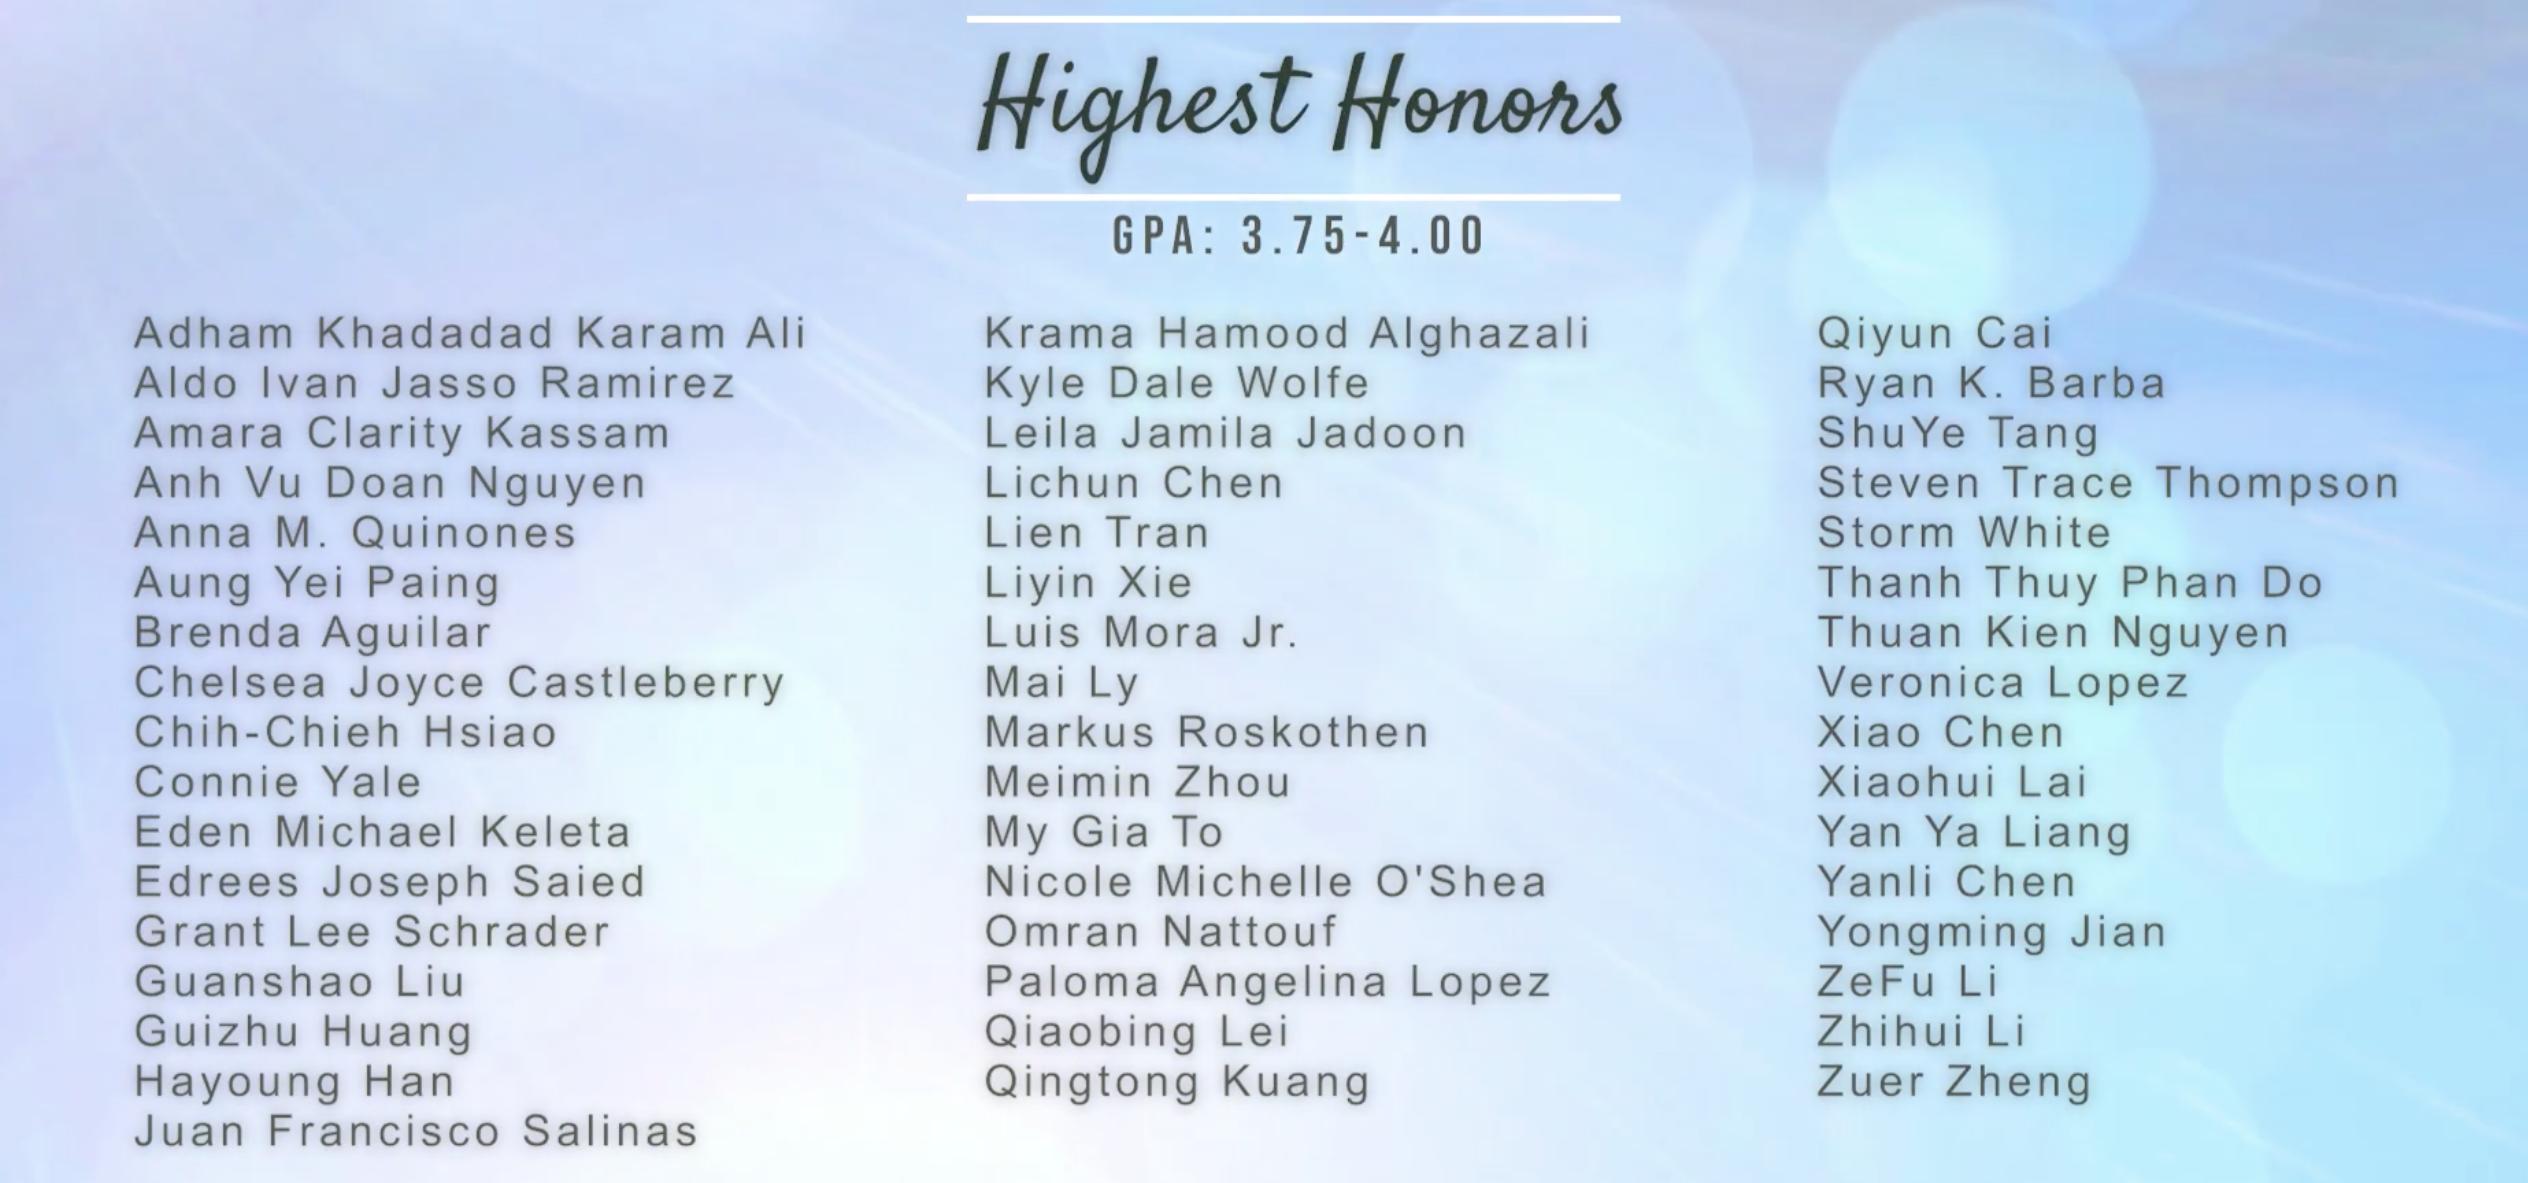 highest honors